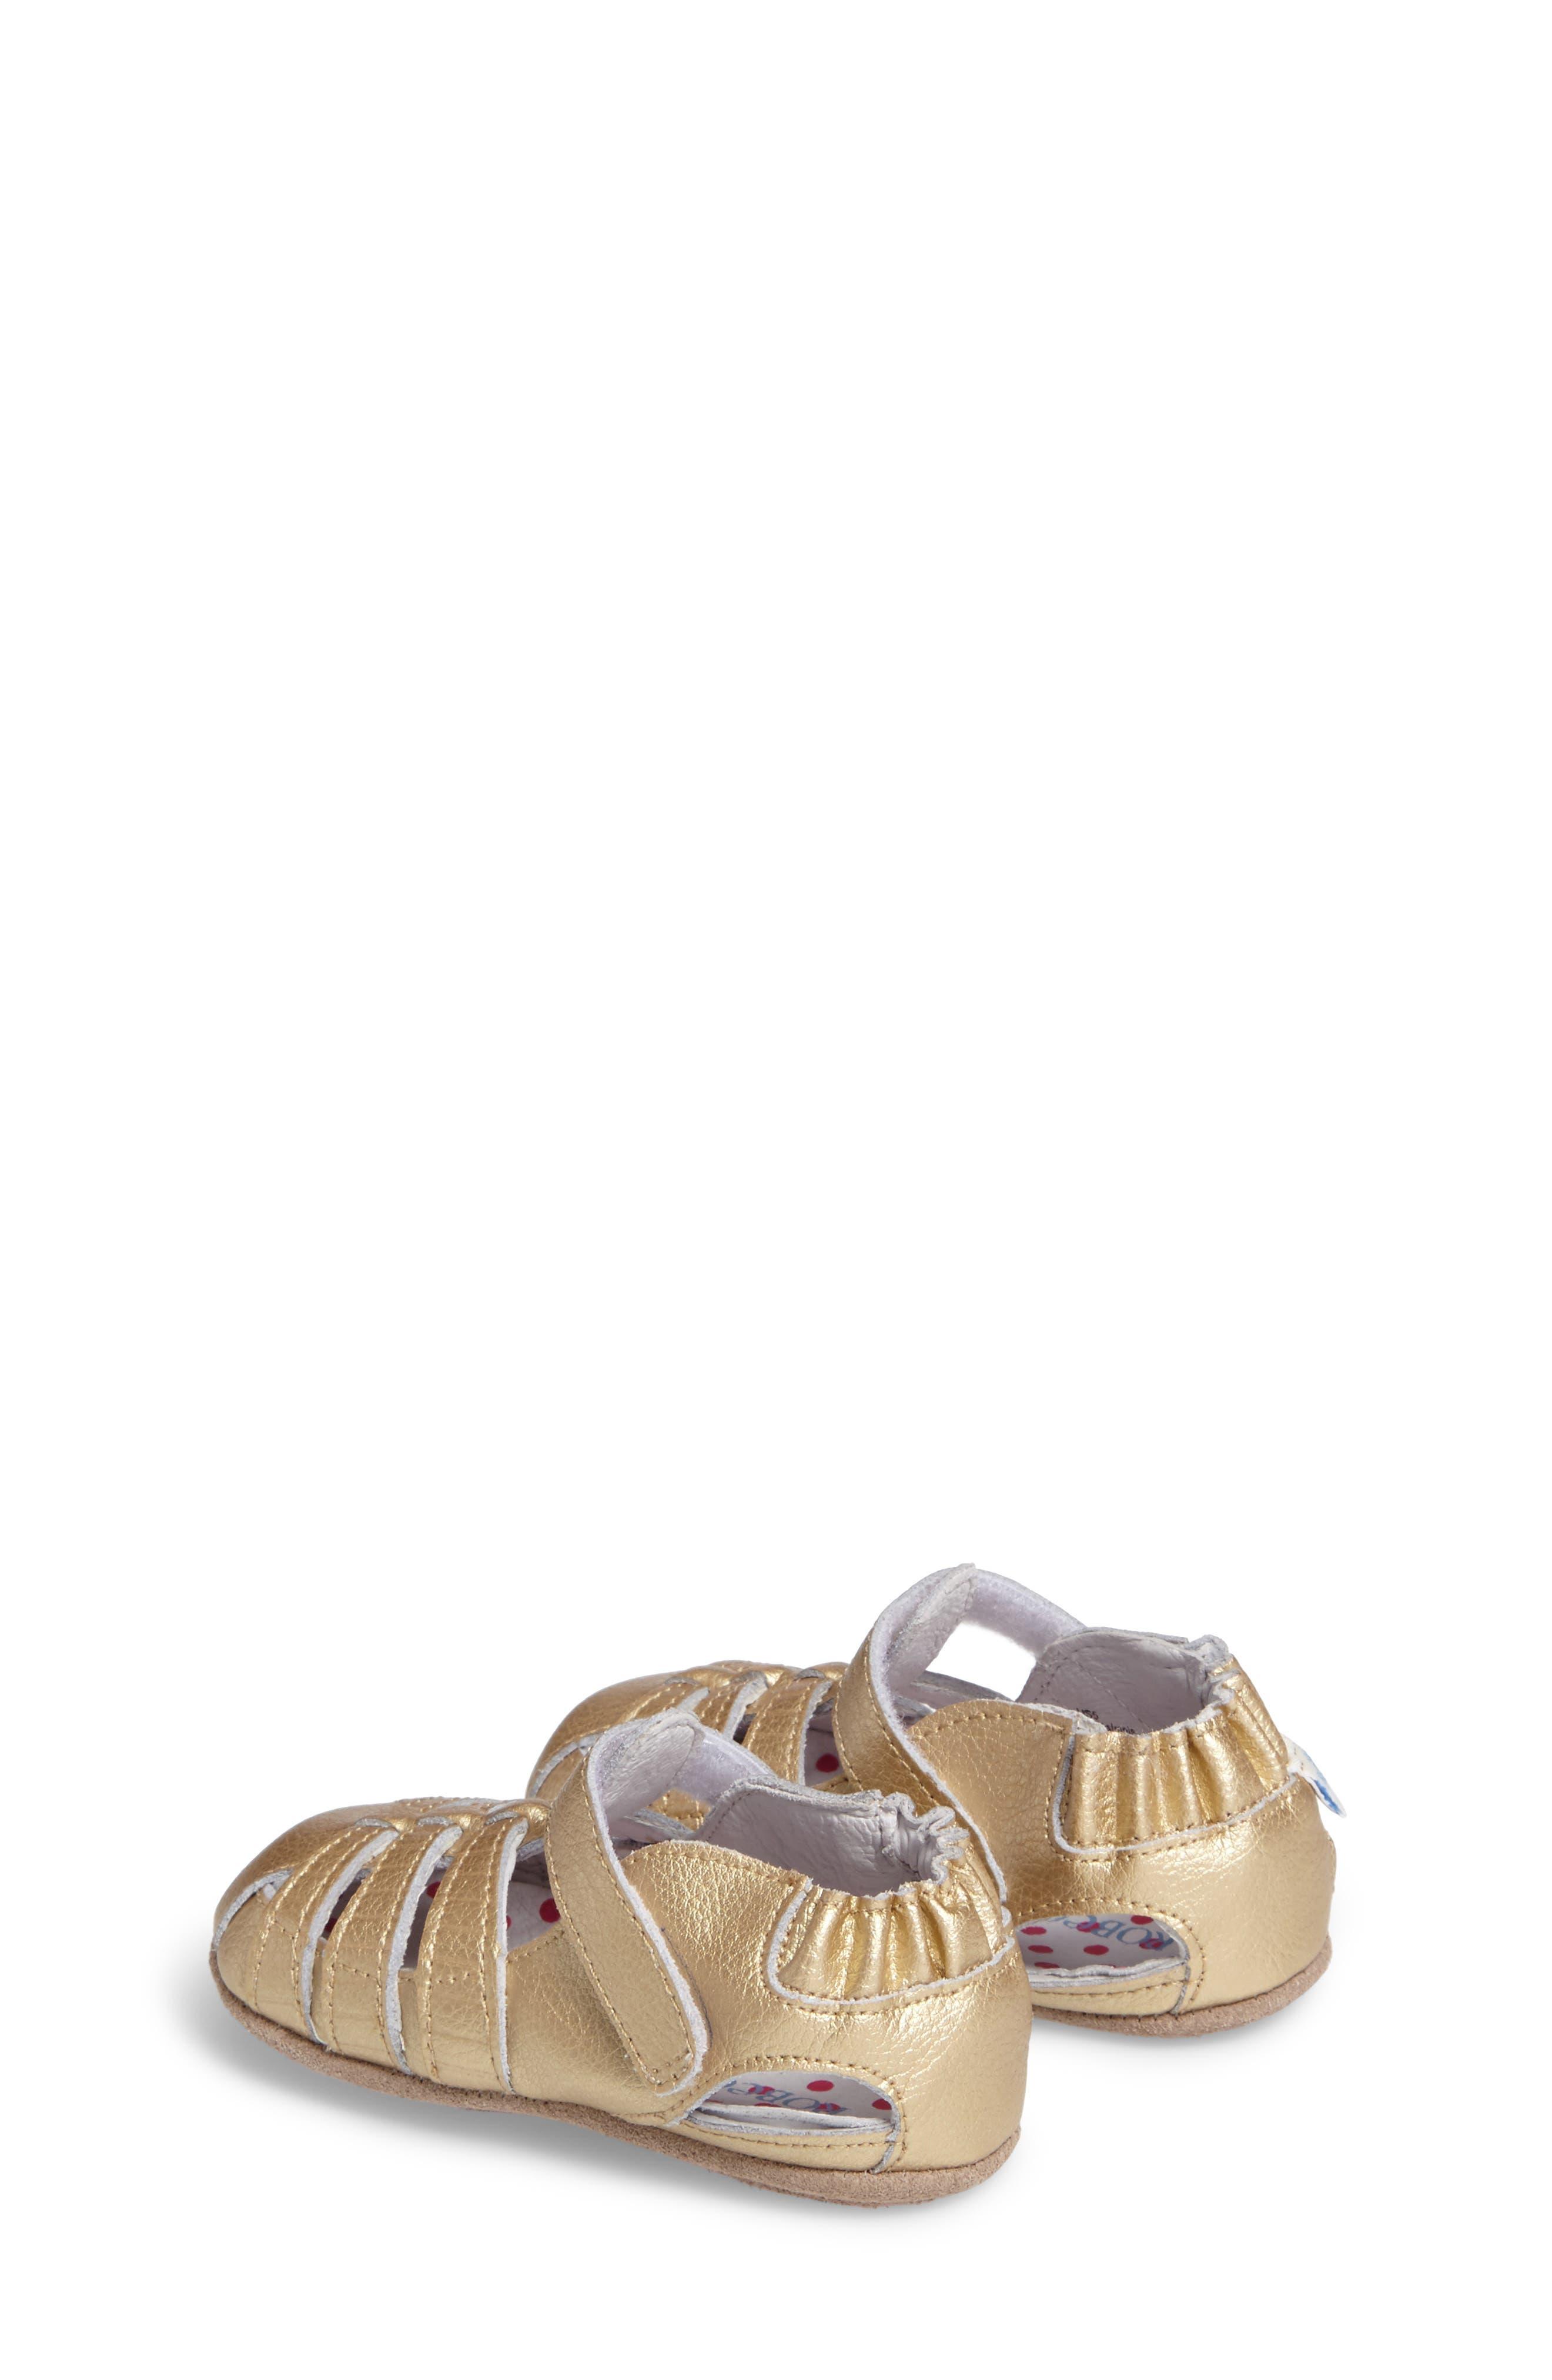 Paris Crib Shoe,                             Alternate thumbnail 2, color,                             GOLD